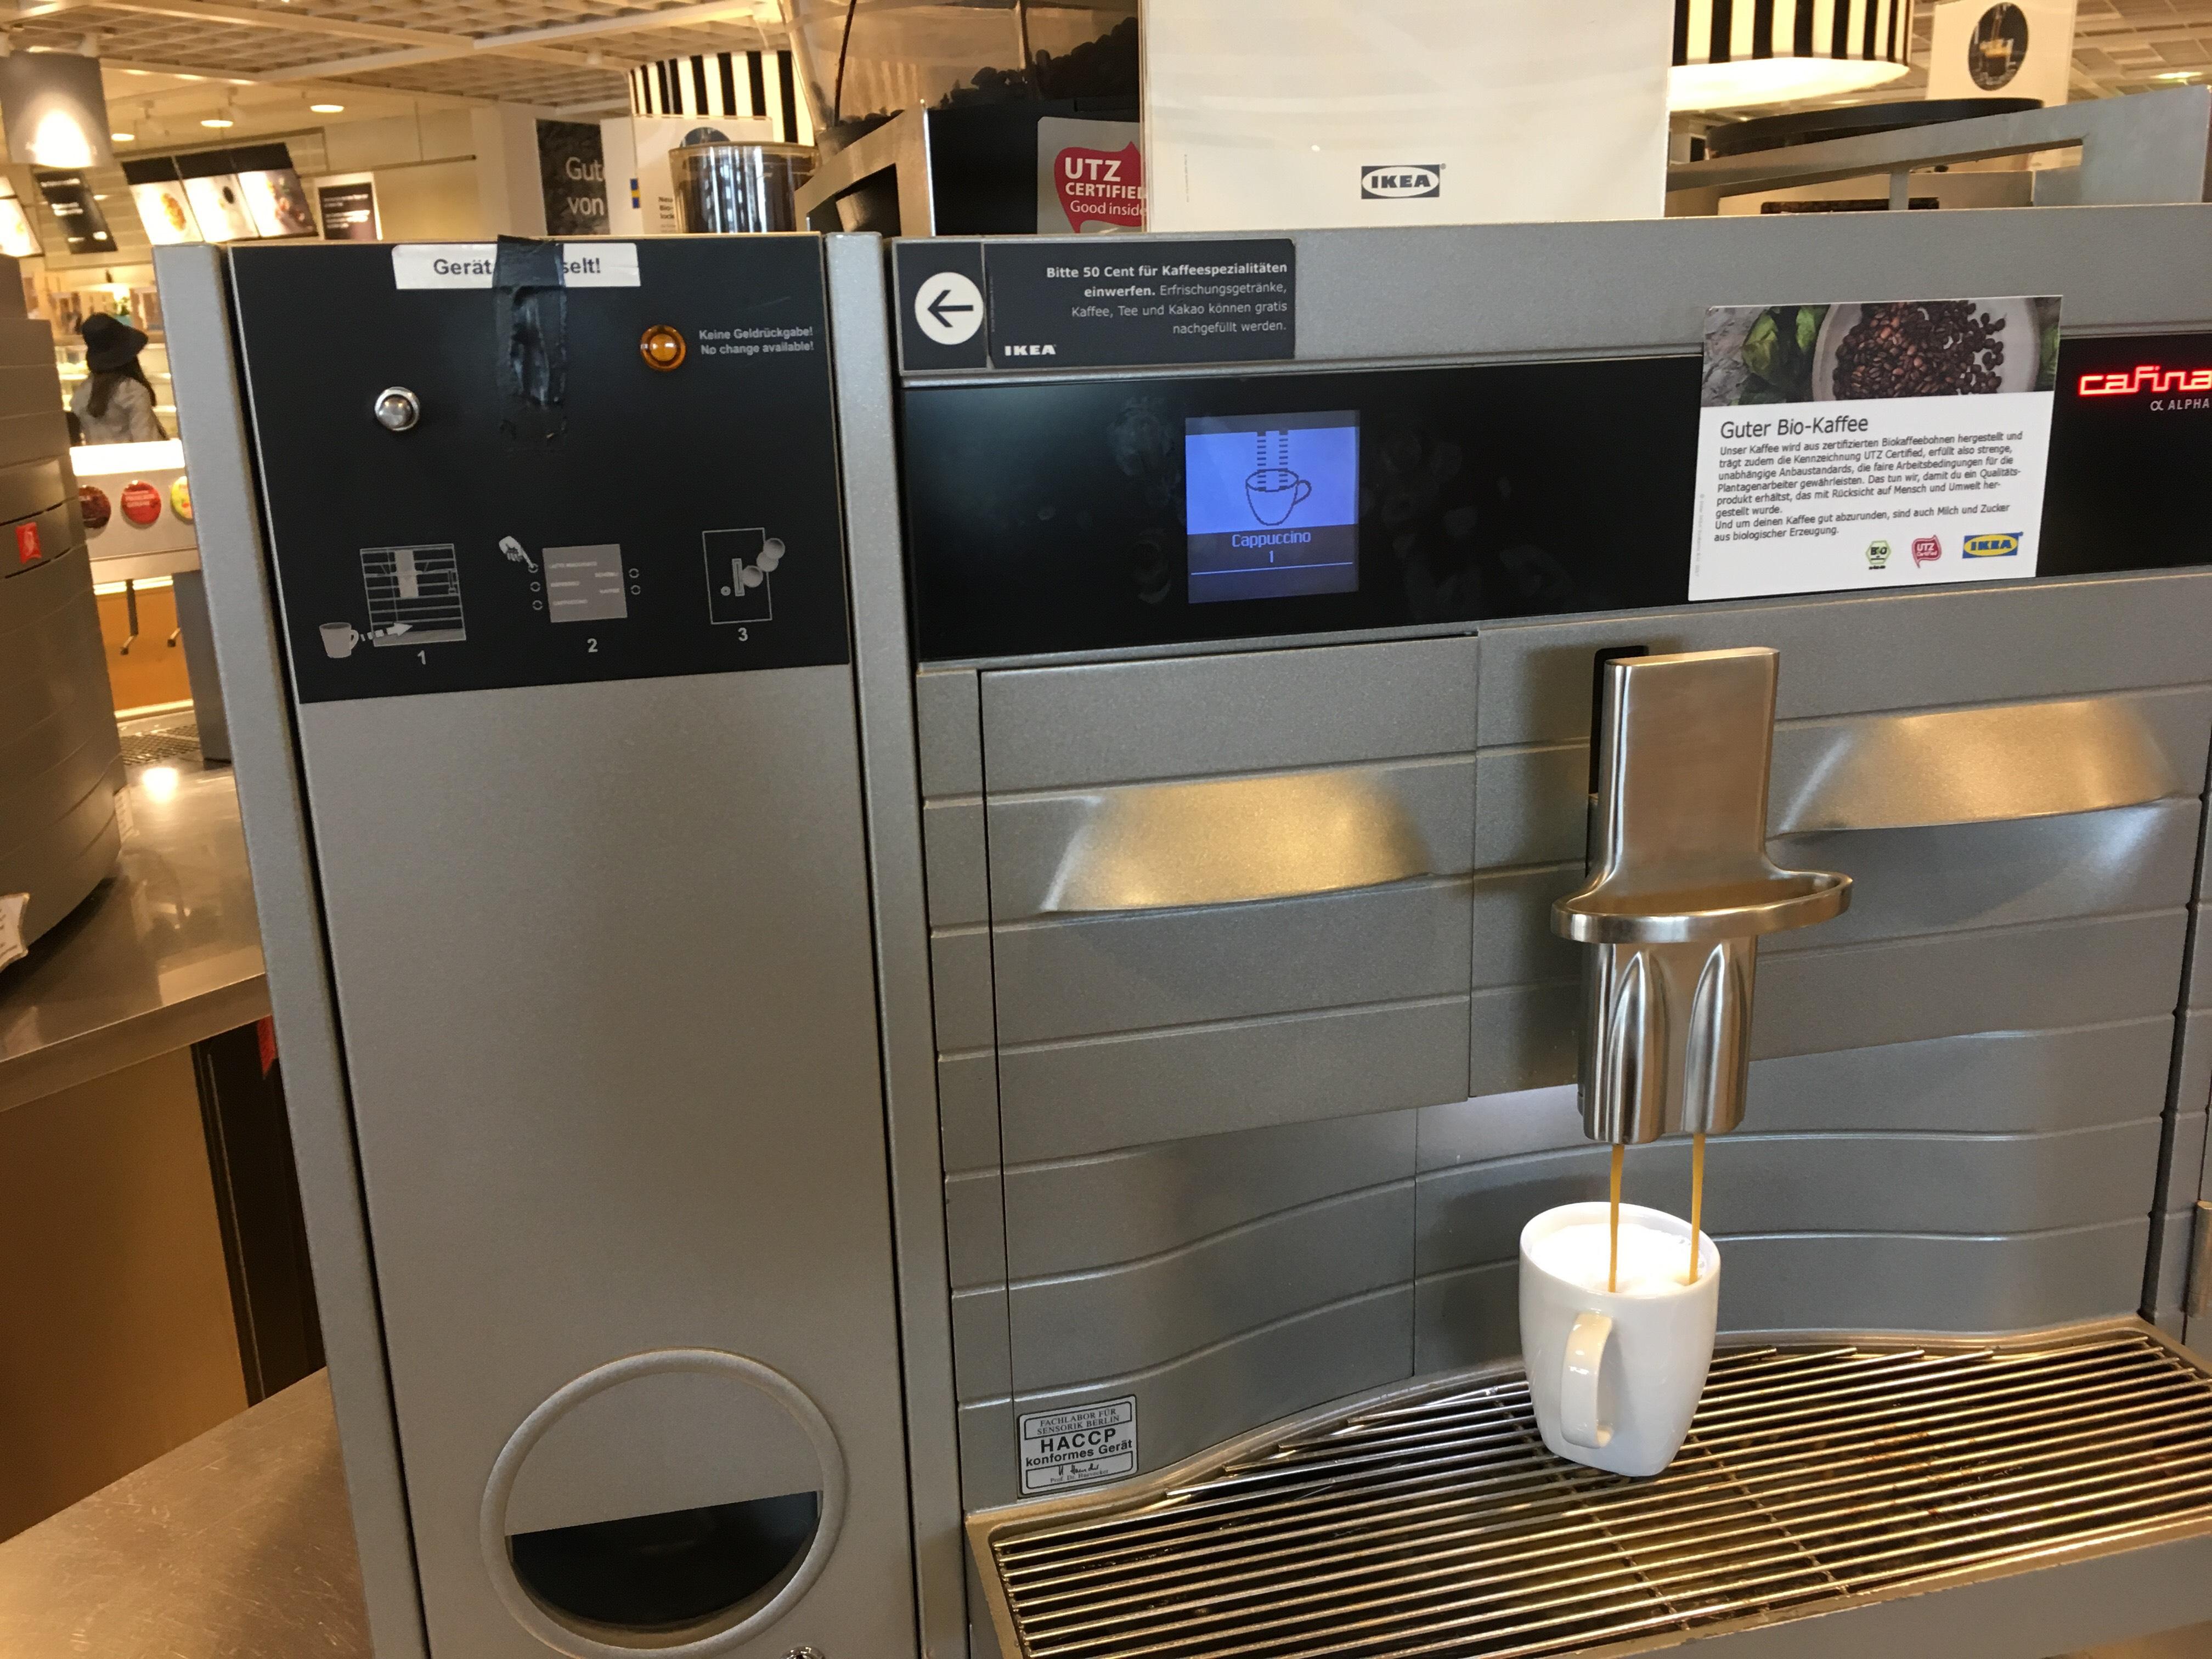 Ikea Dortmund - free Cappuccino und Milchkaffee.